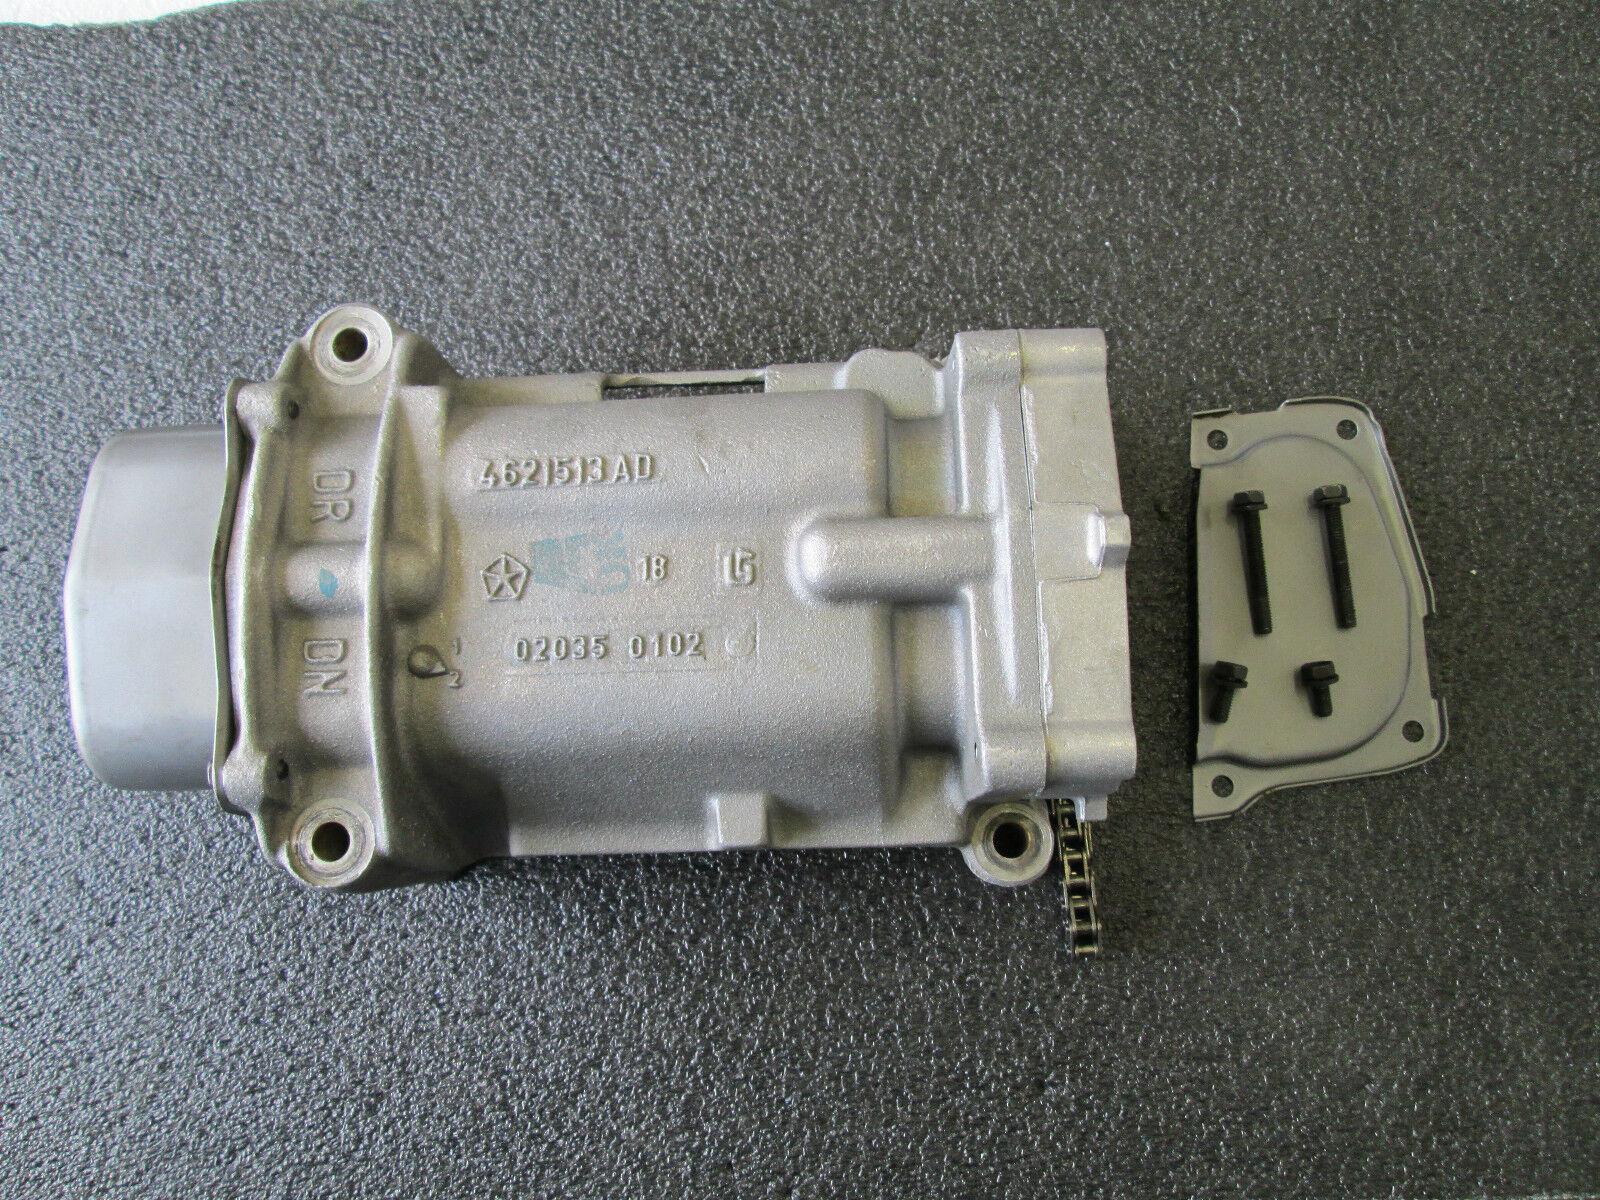 01 02 03 04 05 06 07 Chrysler PT Cruiser Engine Balancer ...